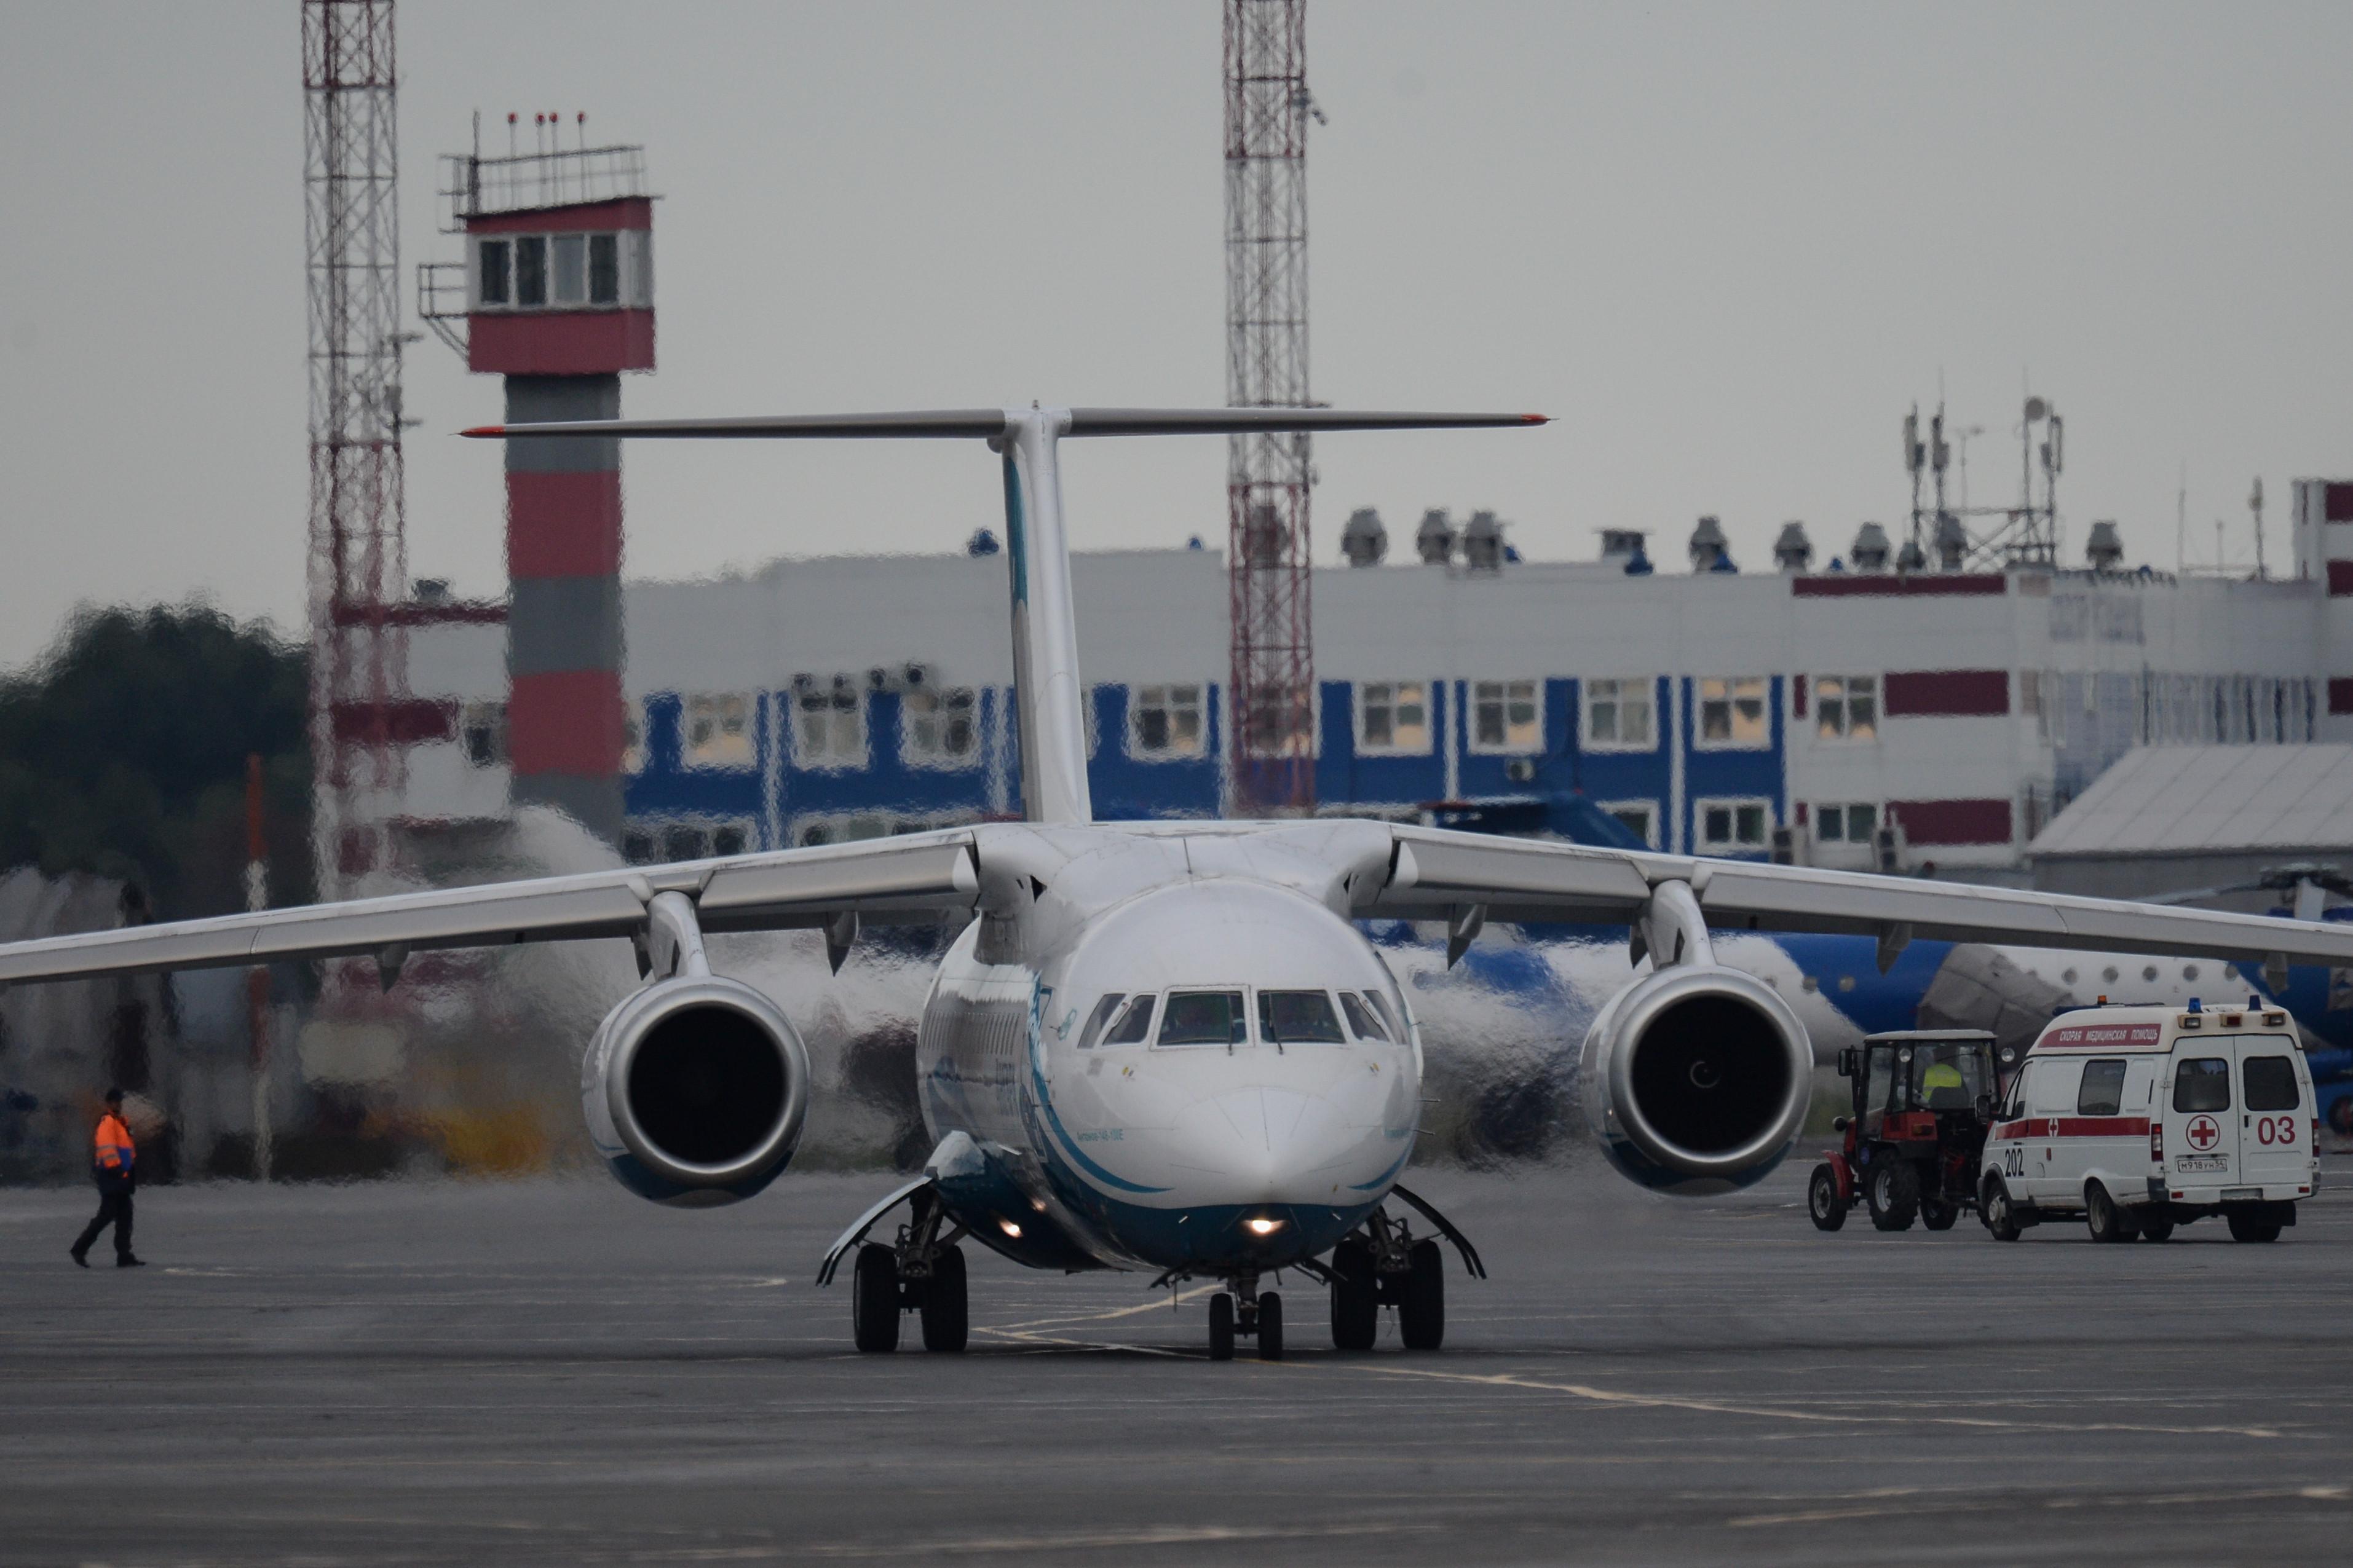 <p>Самолет Ан-148. Фото: &copy;РИА Новости/Александр Кряжев</p>